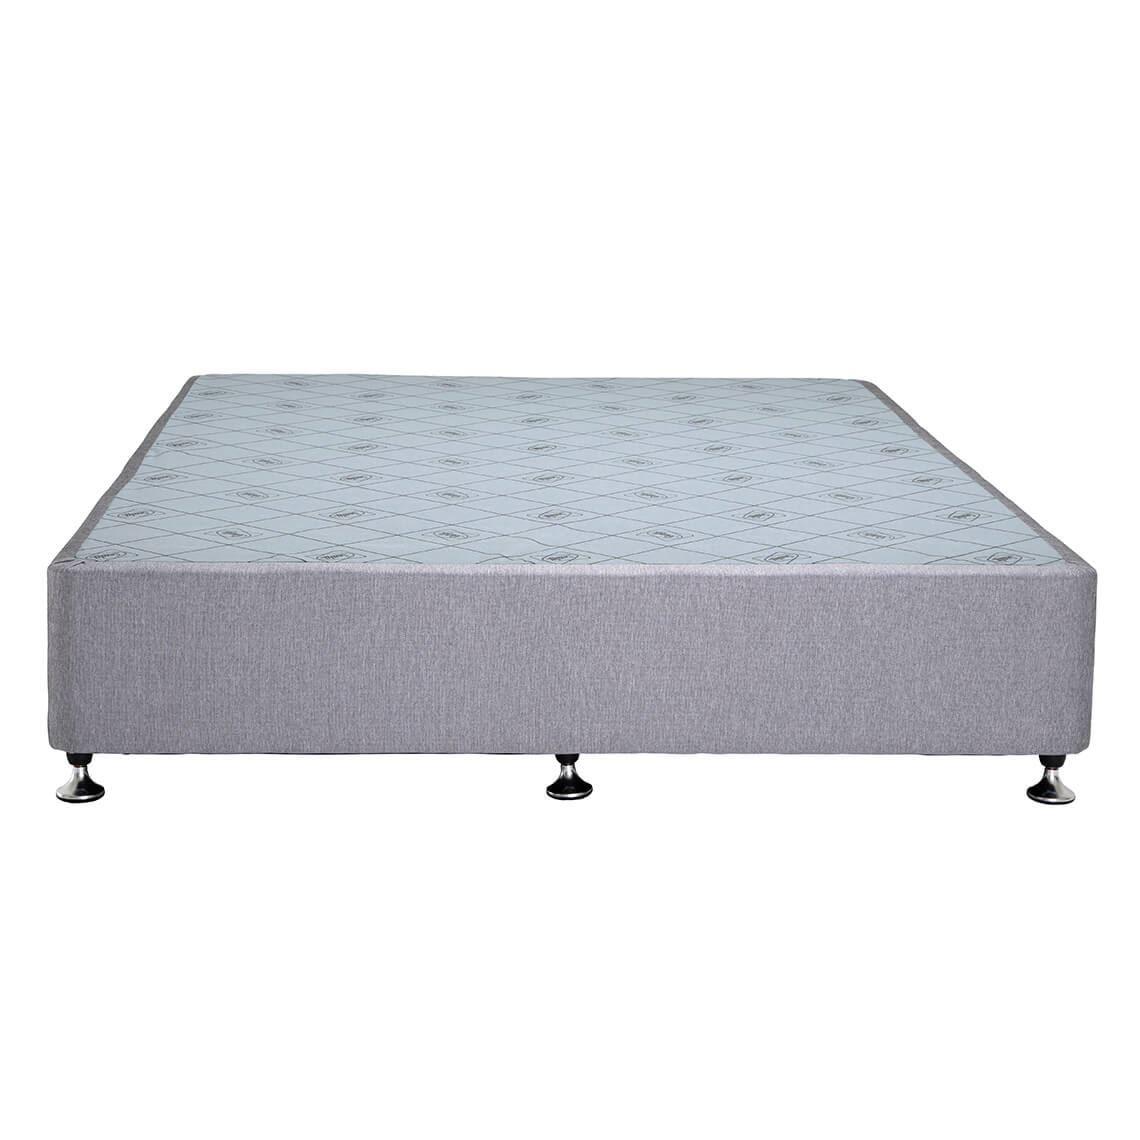 Freedom Sealy Posturepedic Extra Long Single Bed Base Size W 92cm